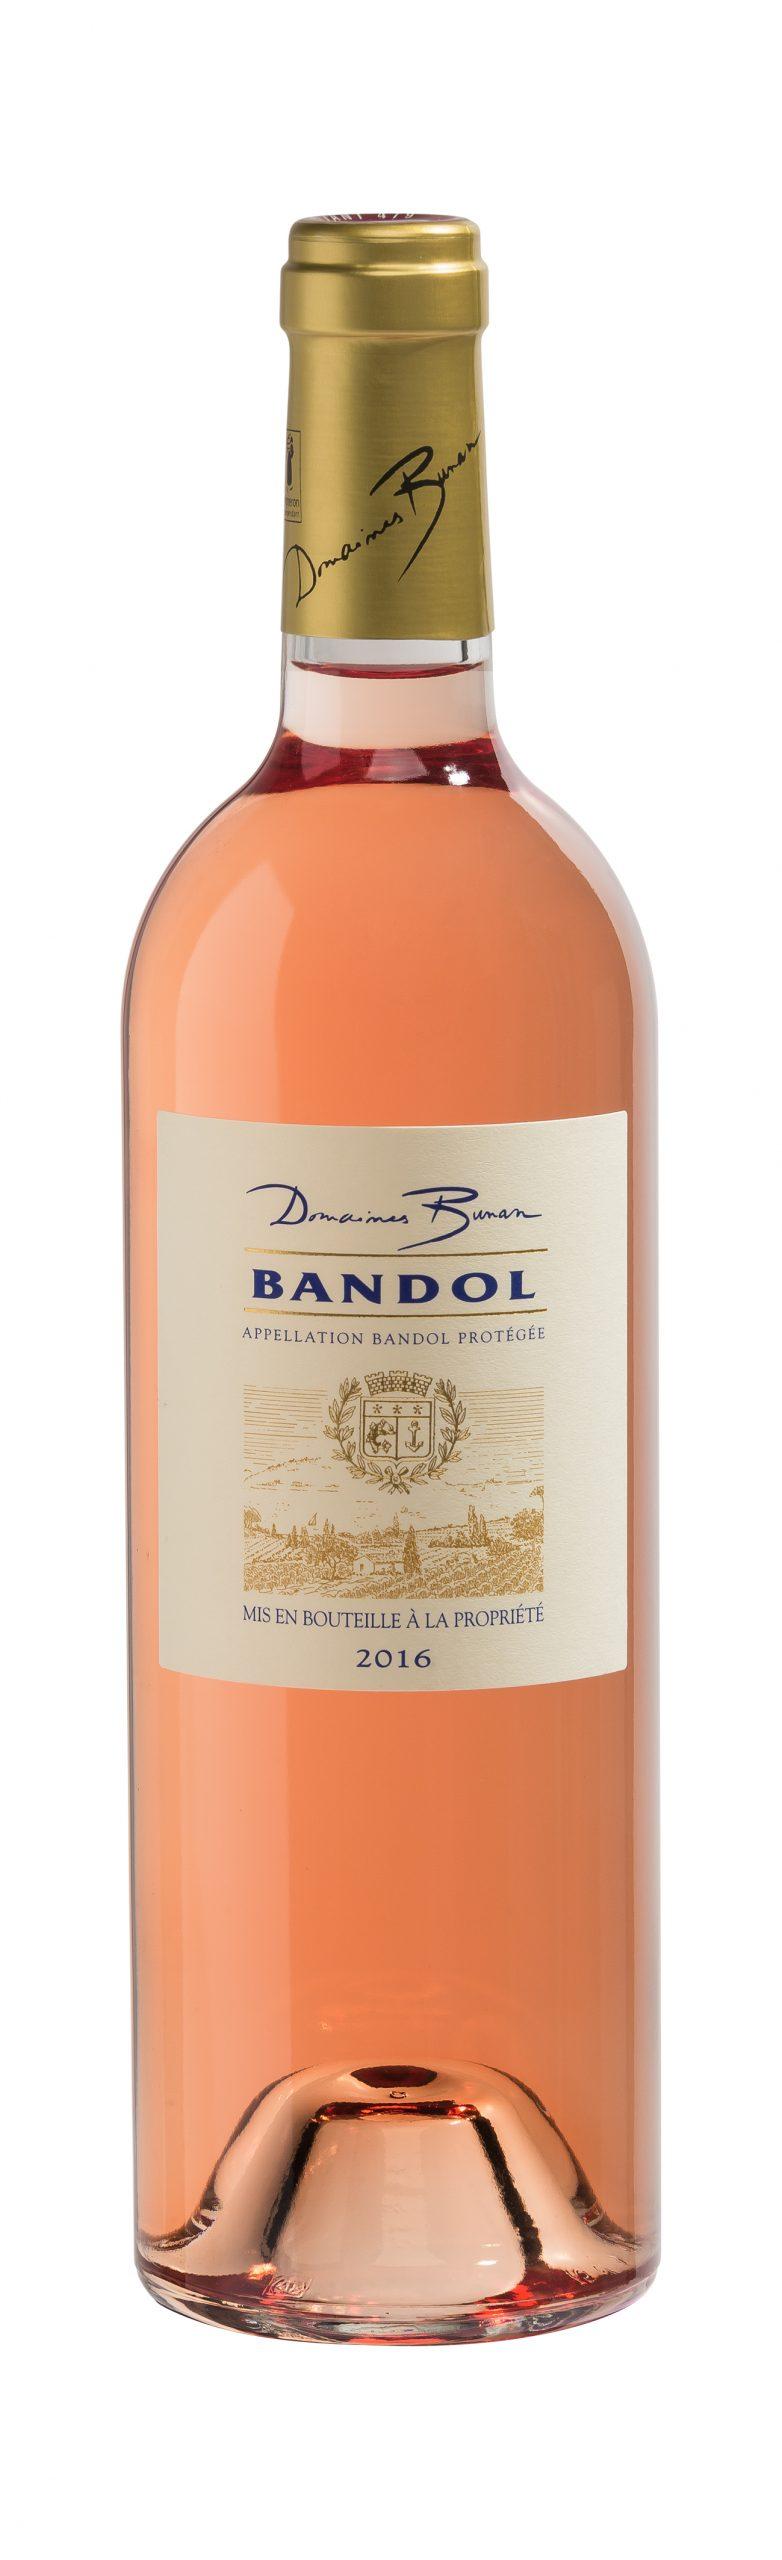 AOP BANDOL ROSÉ (75CL) DOMAINES BUNAN